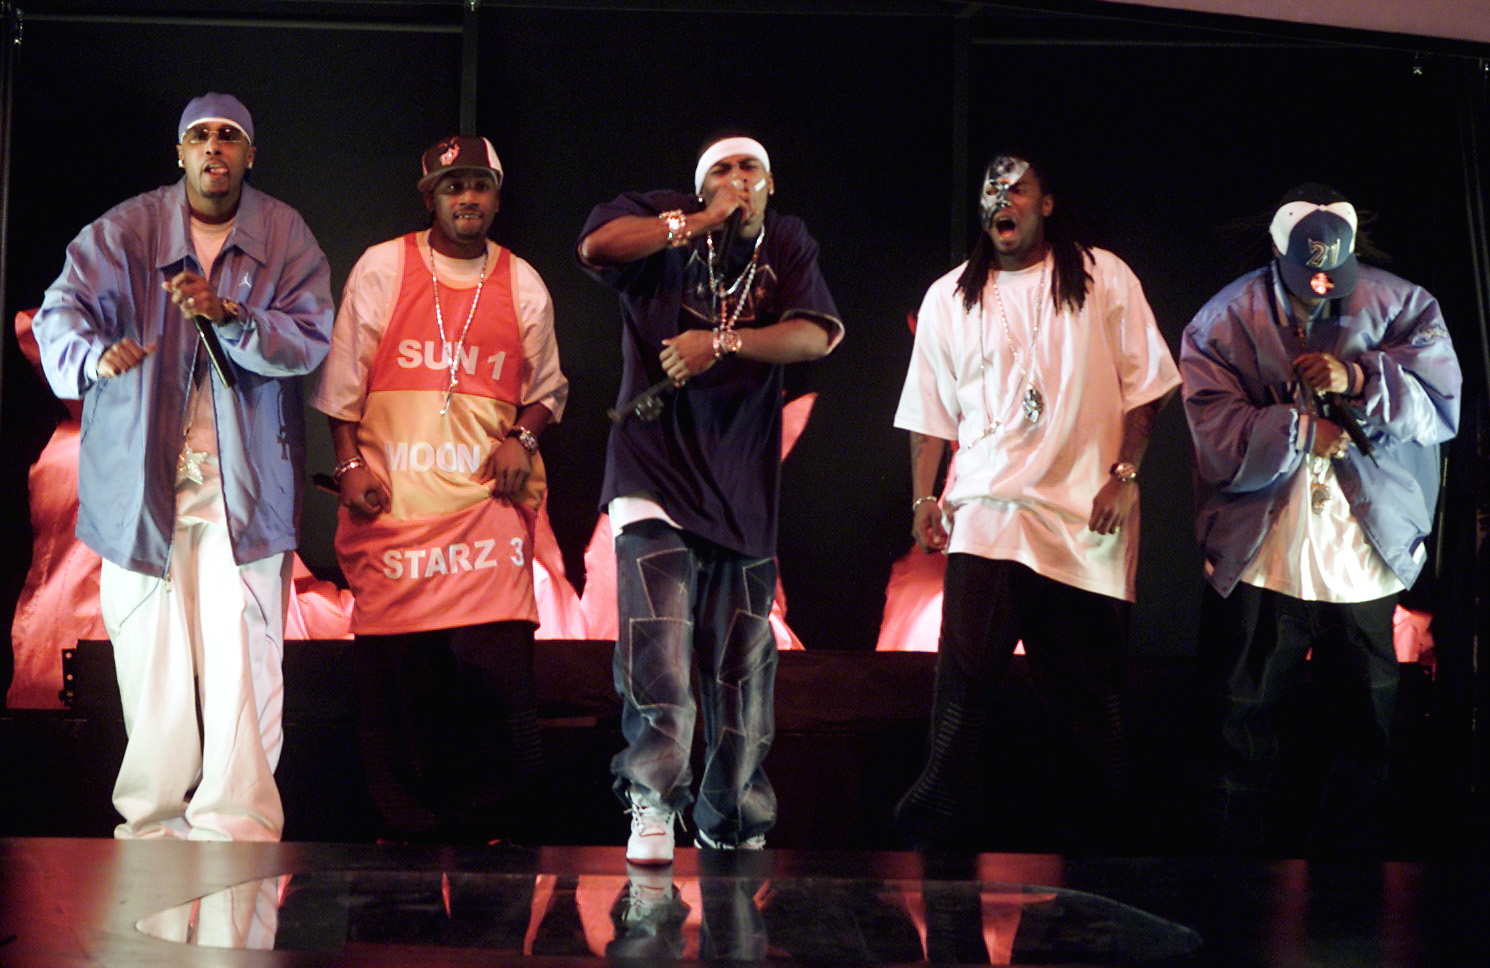 2002 Billboard Music Awards - Ceremony